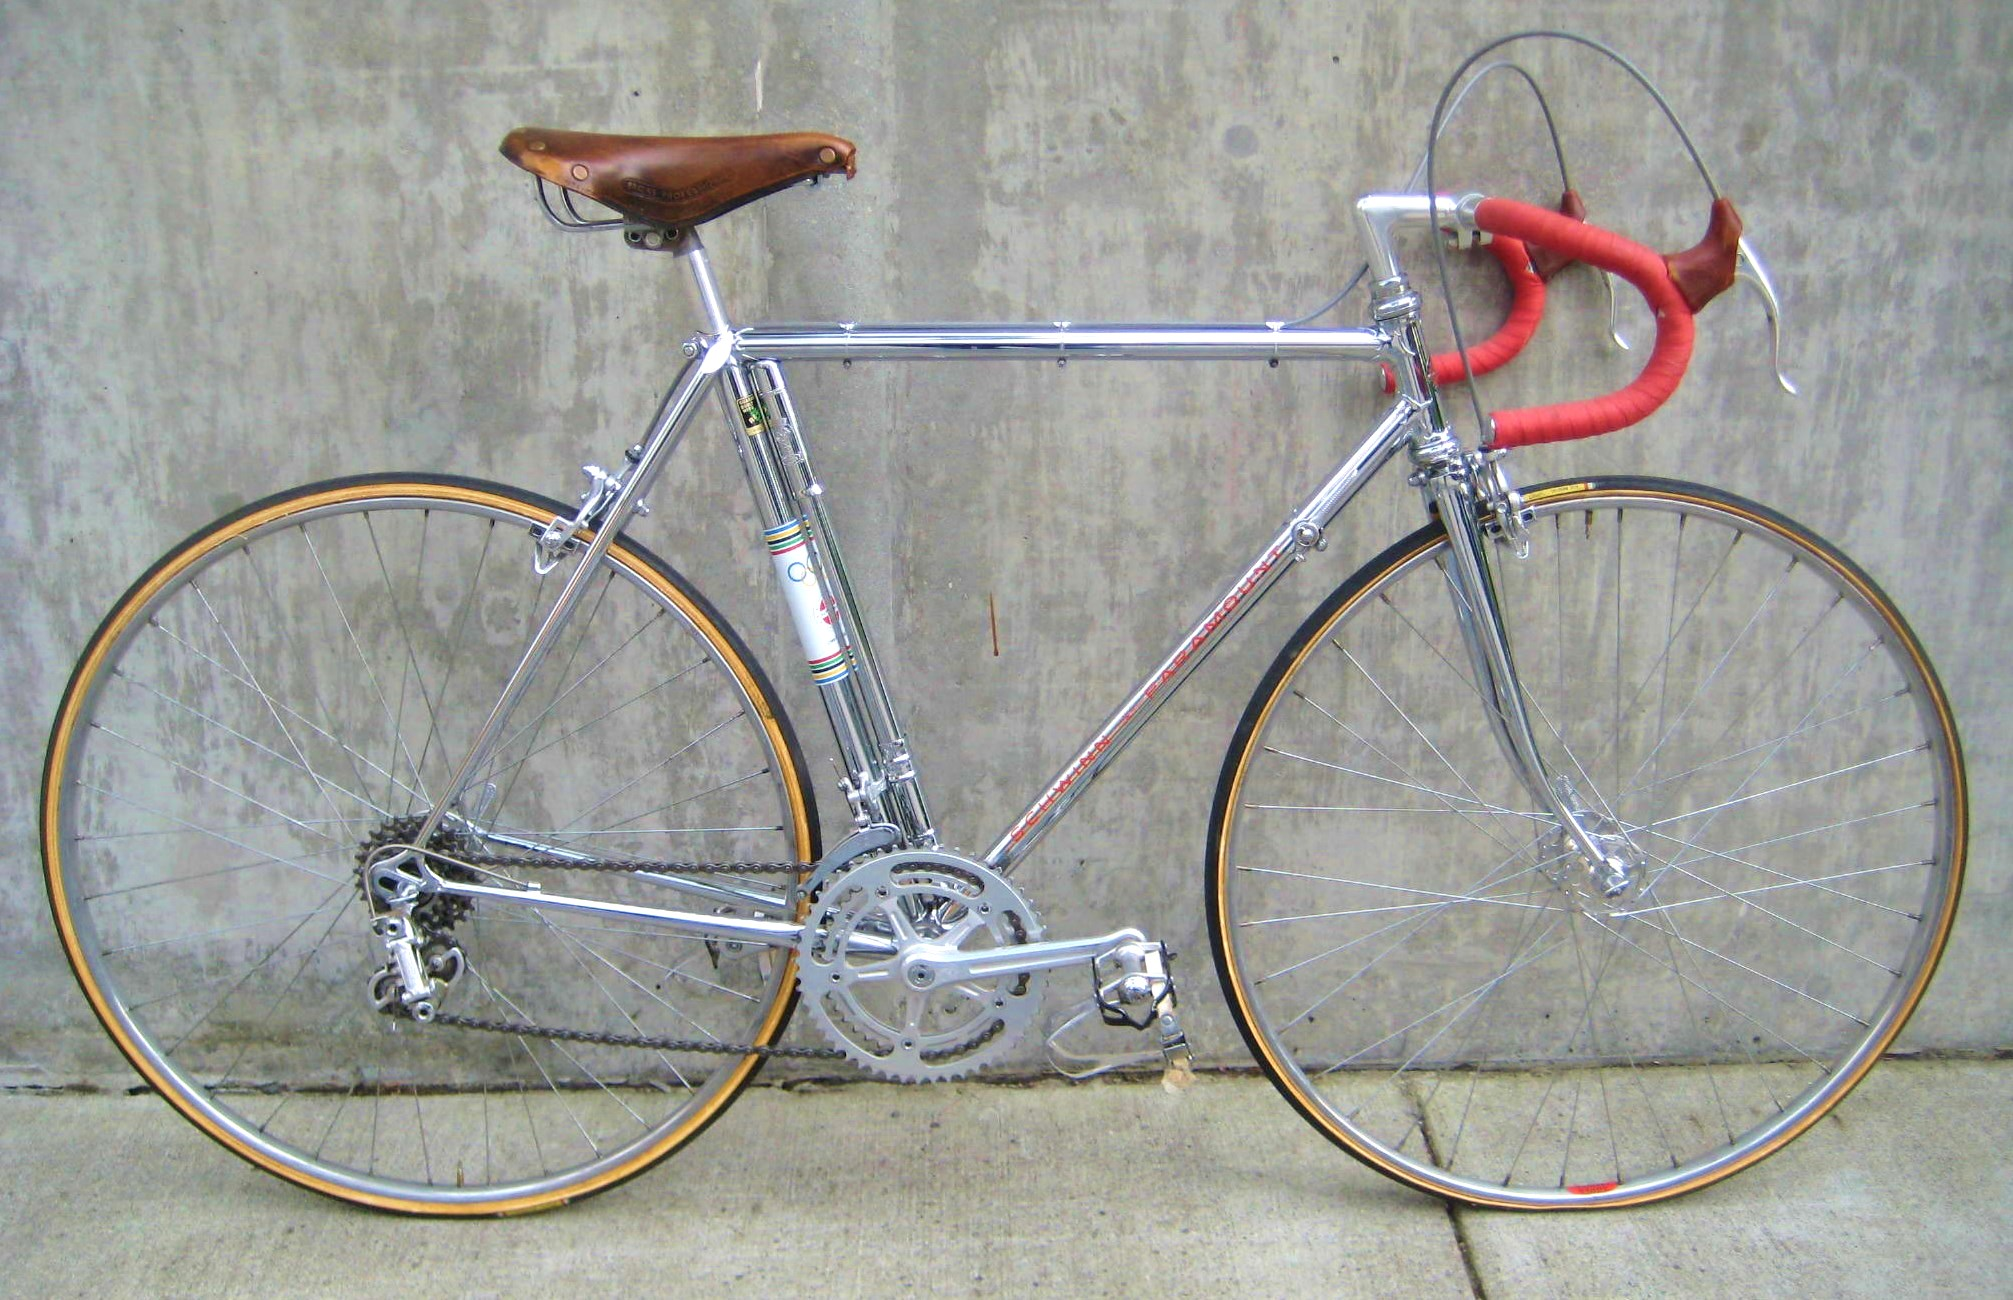 1971 Schwinn Paramount P-13 at Classic Cycle | Classic